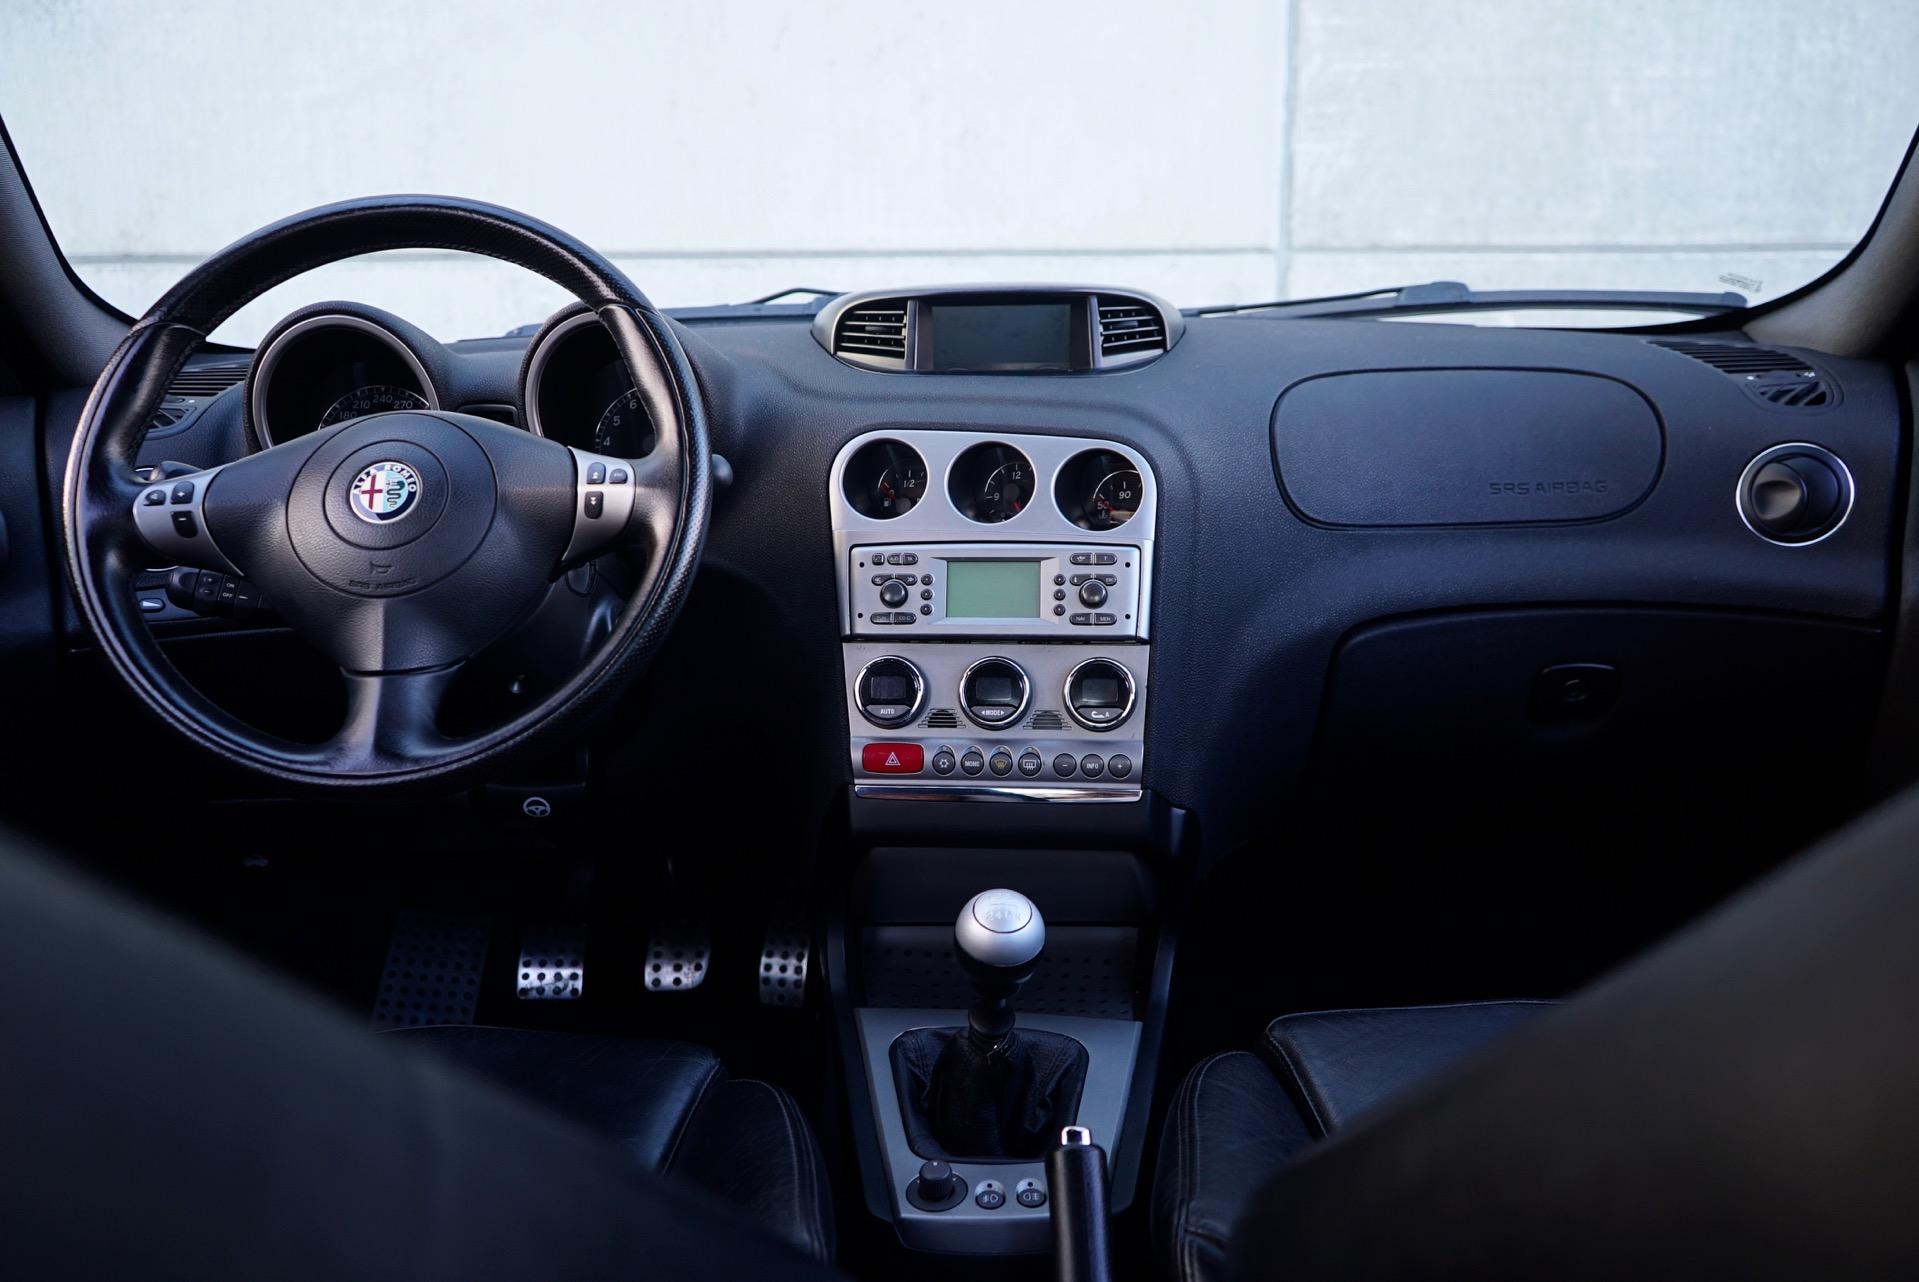 ALFA ROMEO 156 GTA V6 3.2